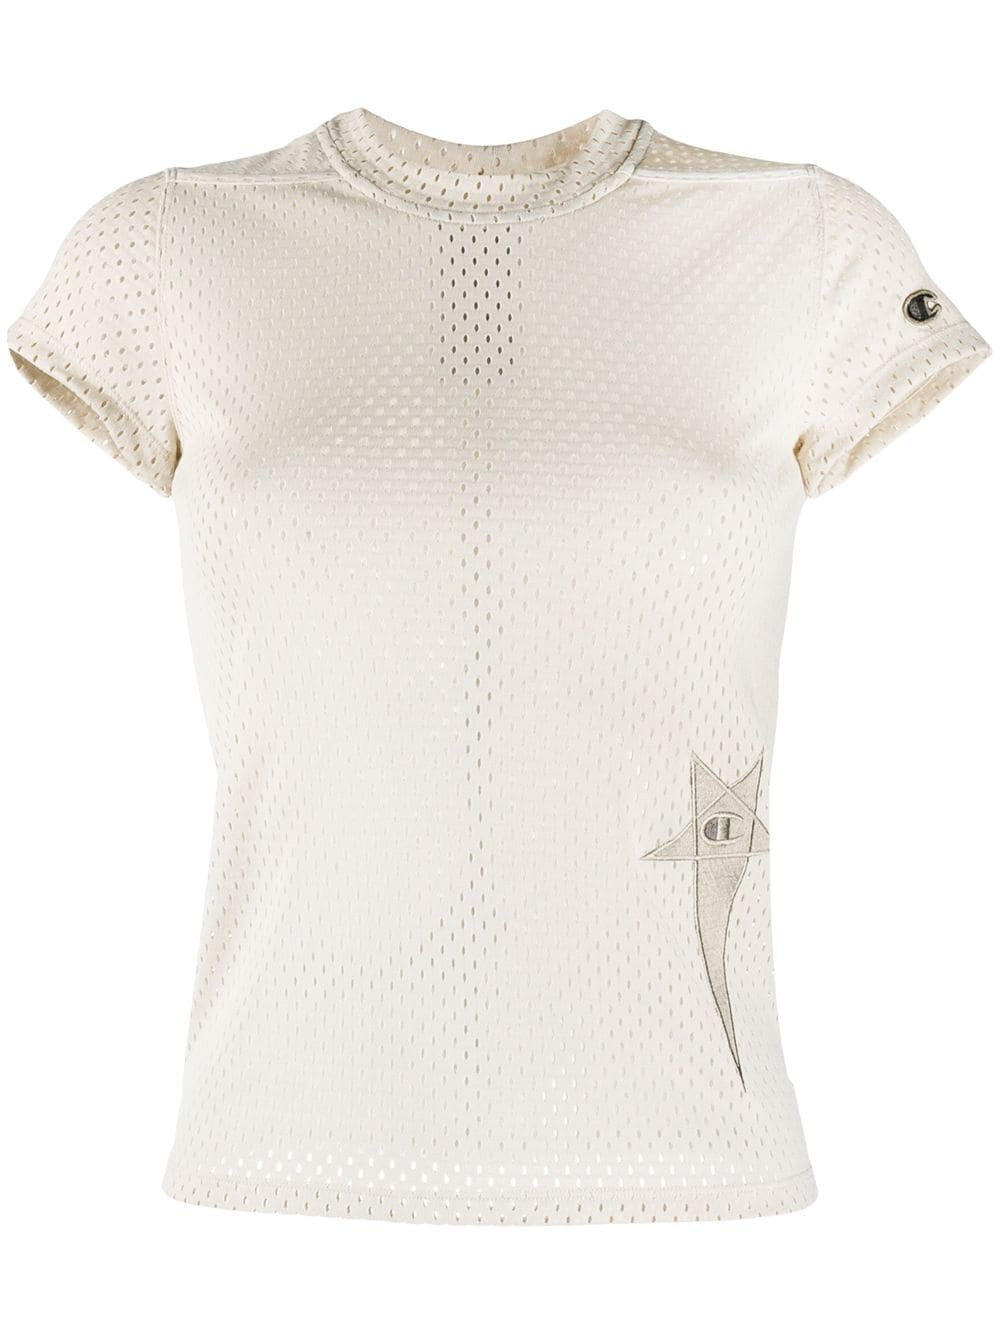 T-shirt - Mesh - Pearl - S-1